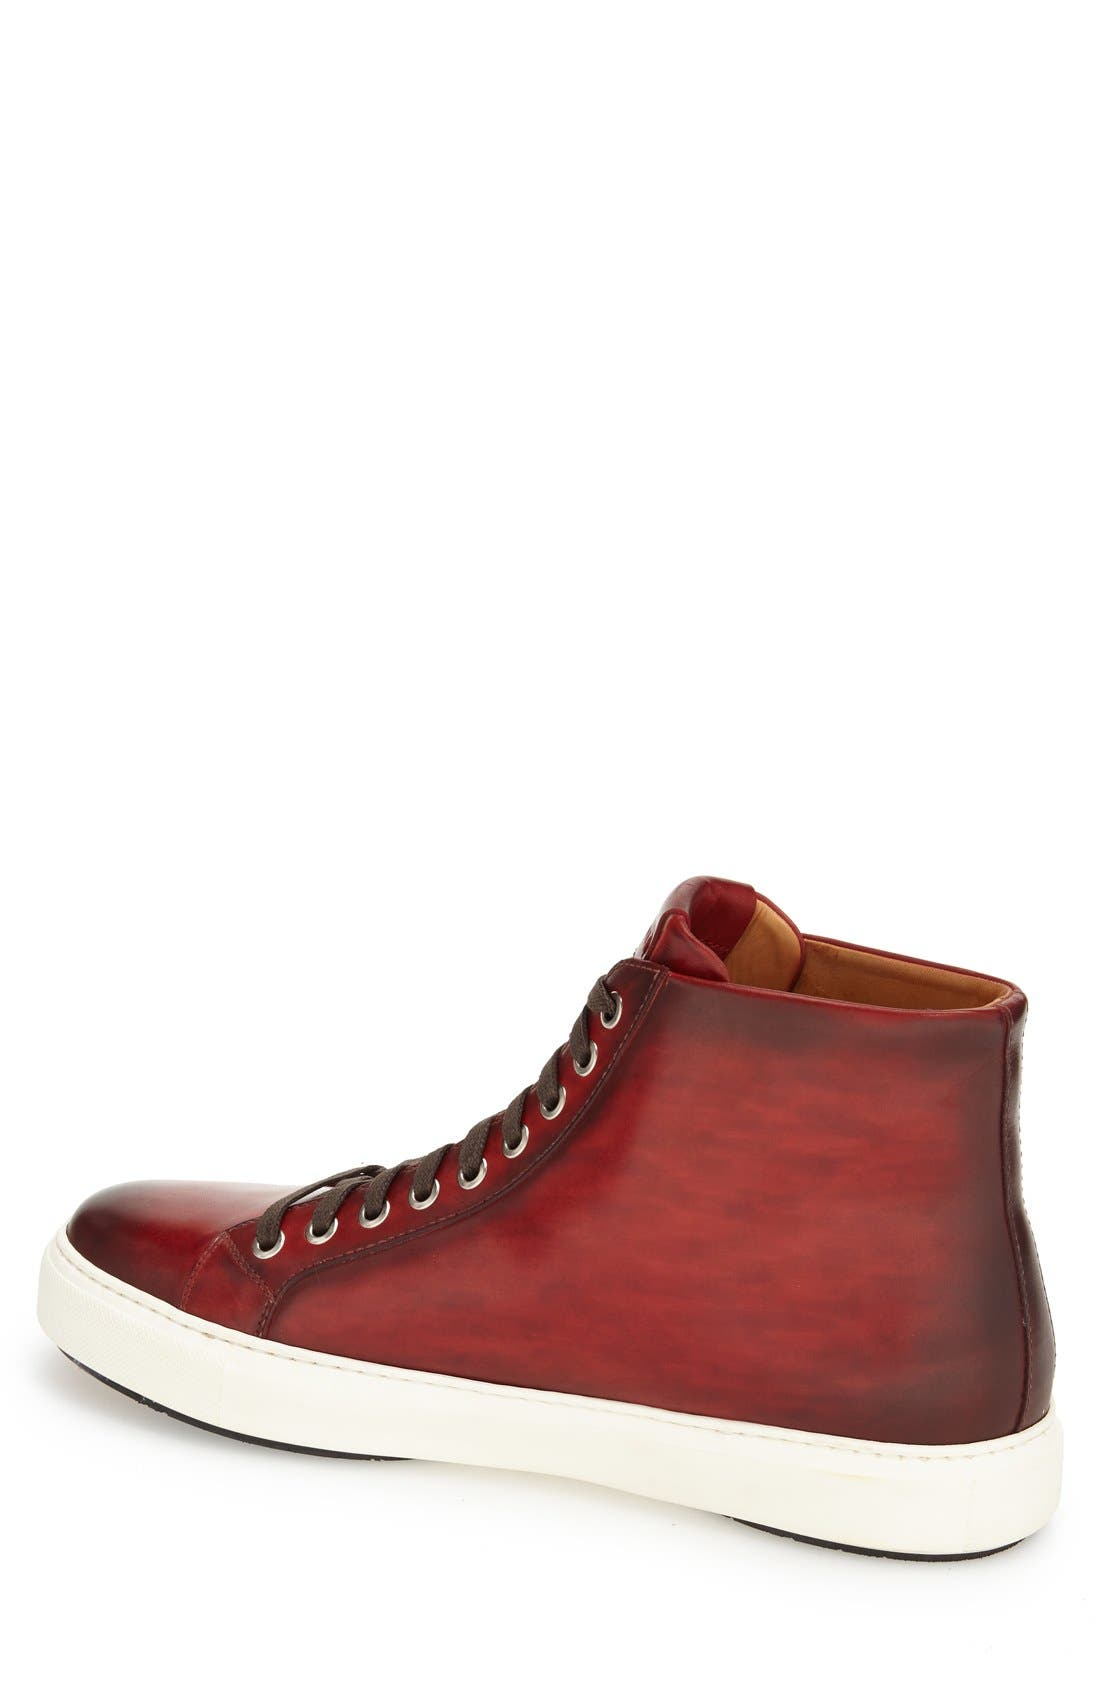 Brando High Top Sneaker,                             Alternate thumbnail 2, color,                             RED